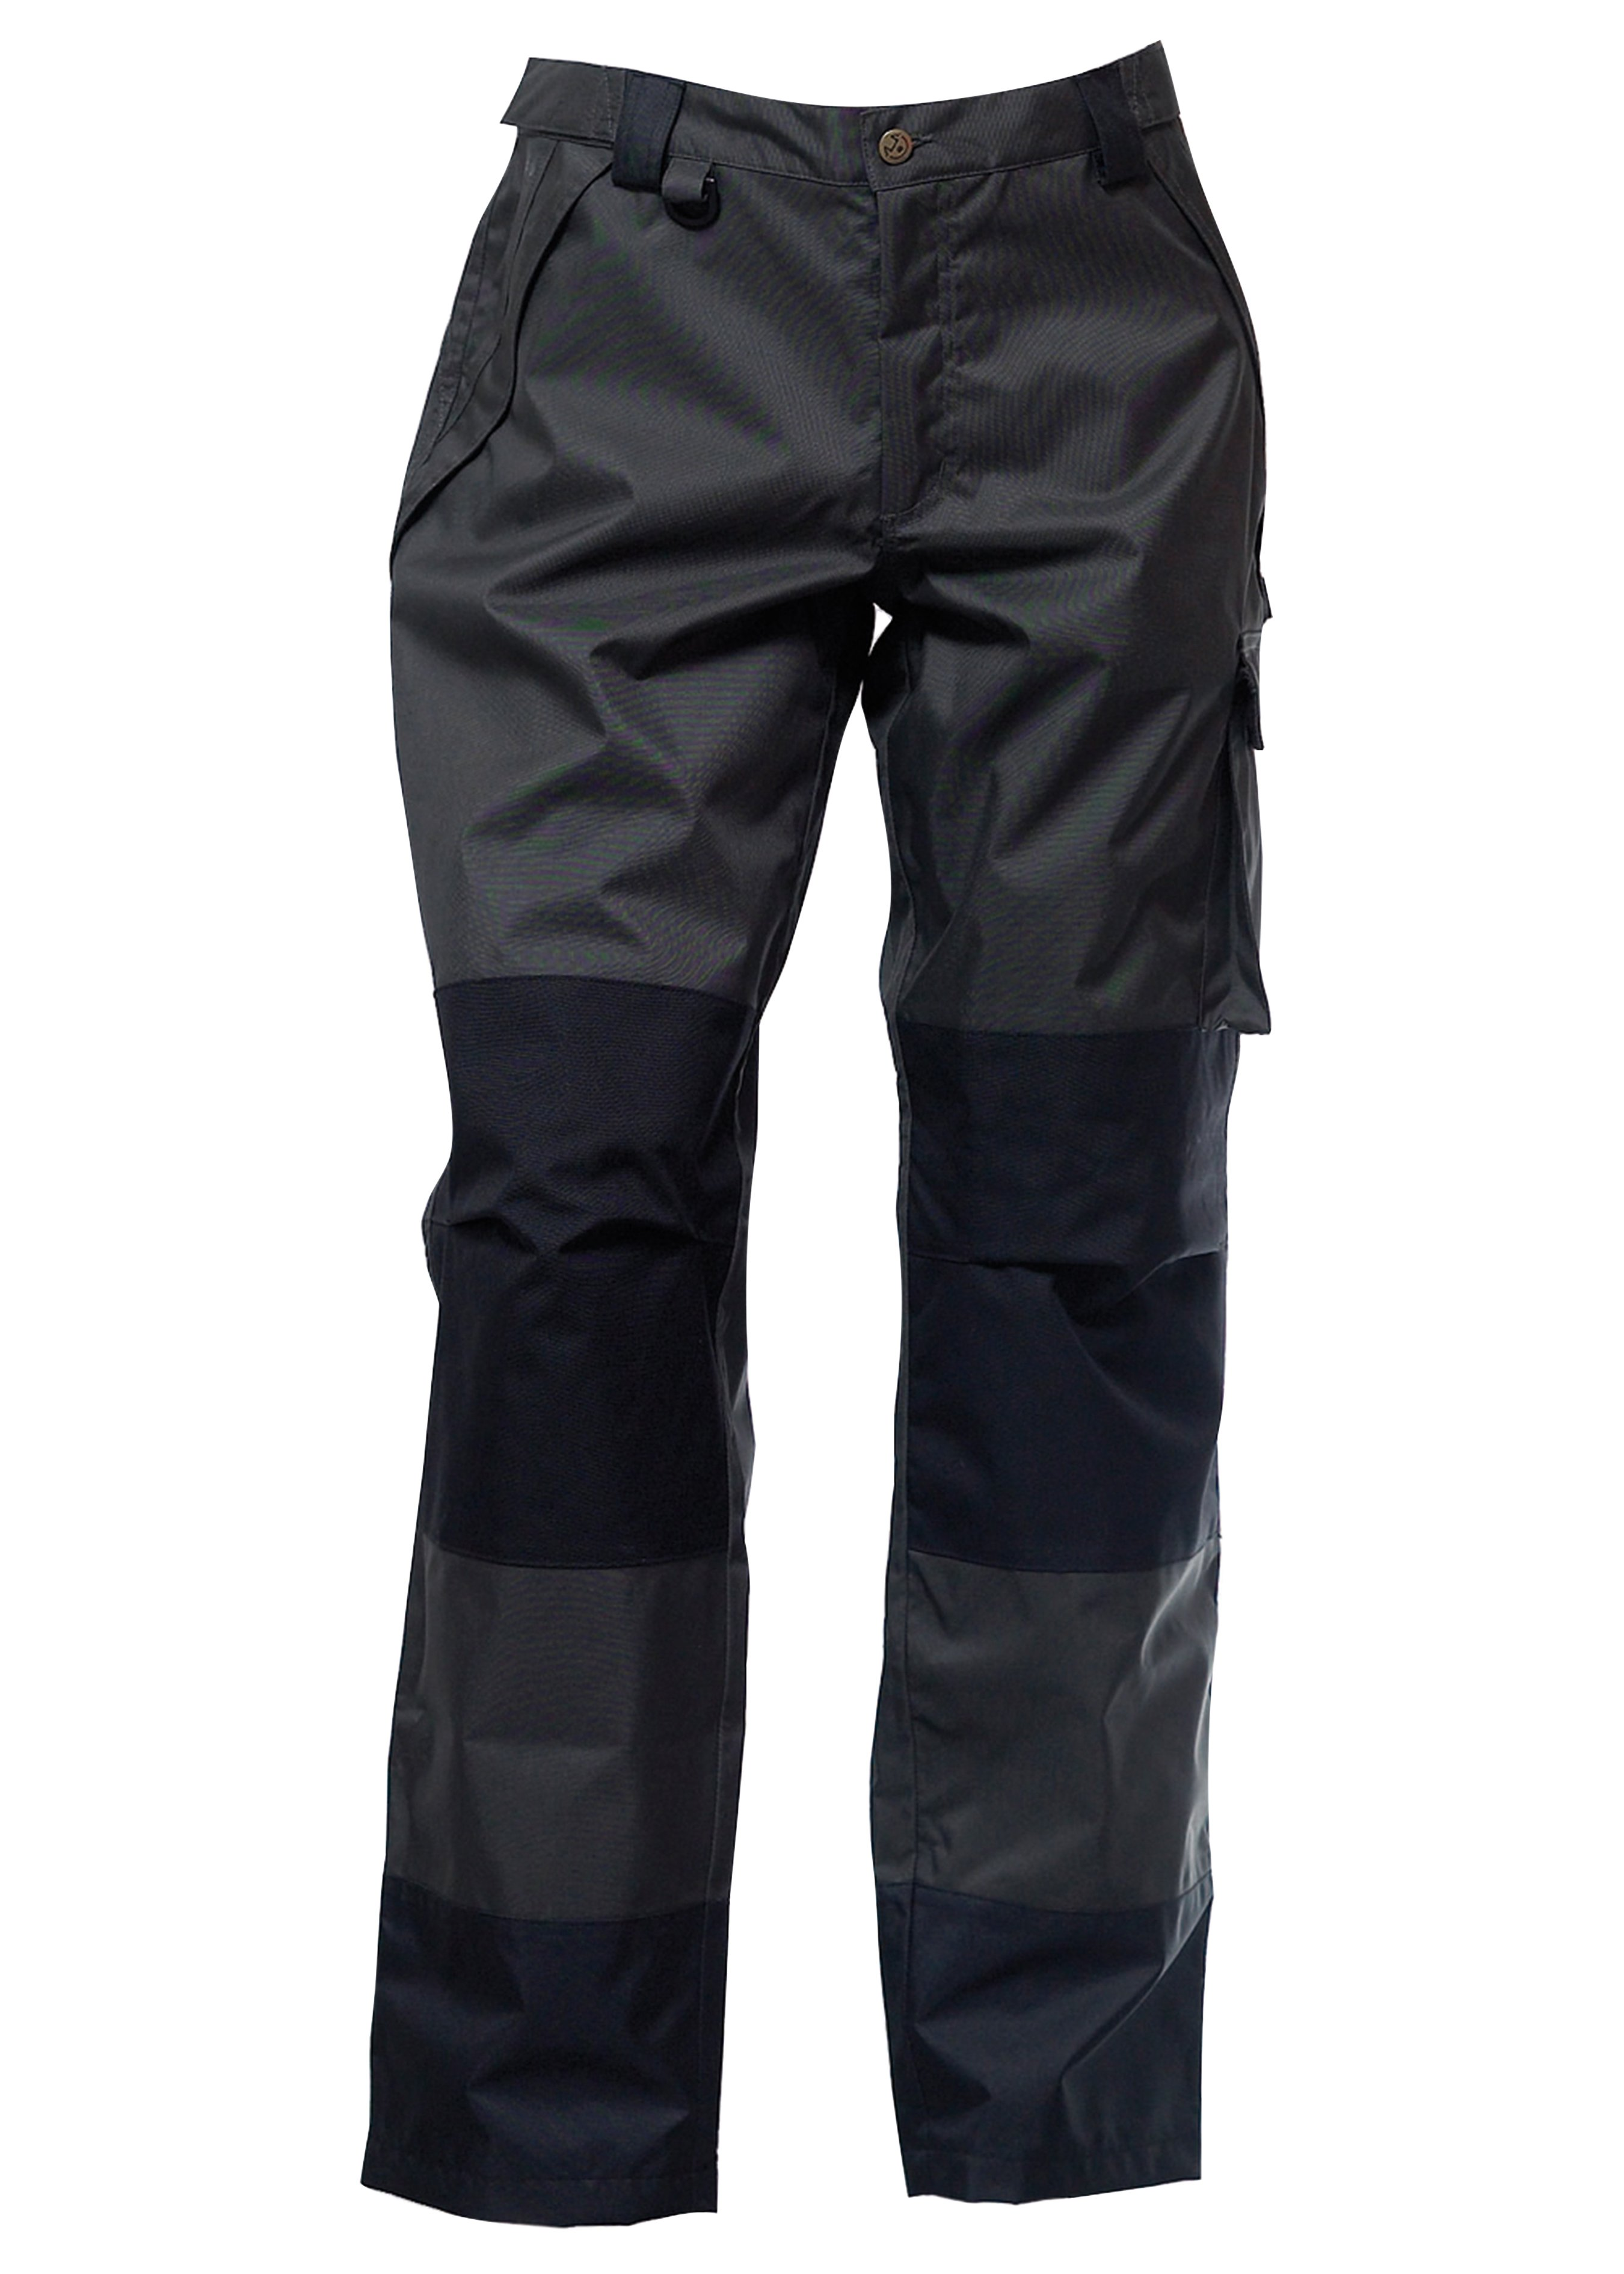 Pantalon imperméable de travail Oxford 2769124XL 1